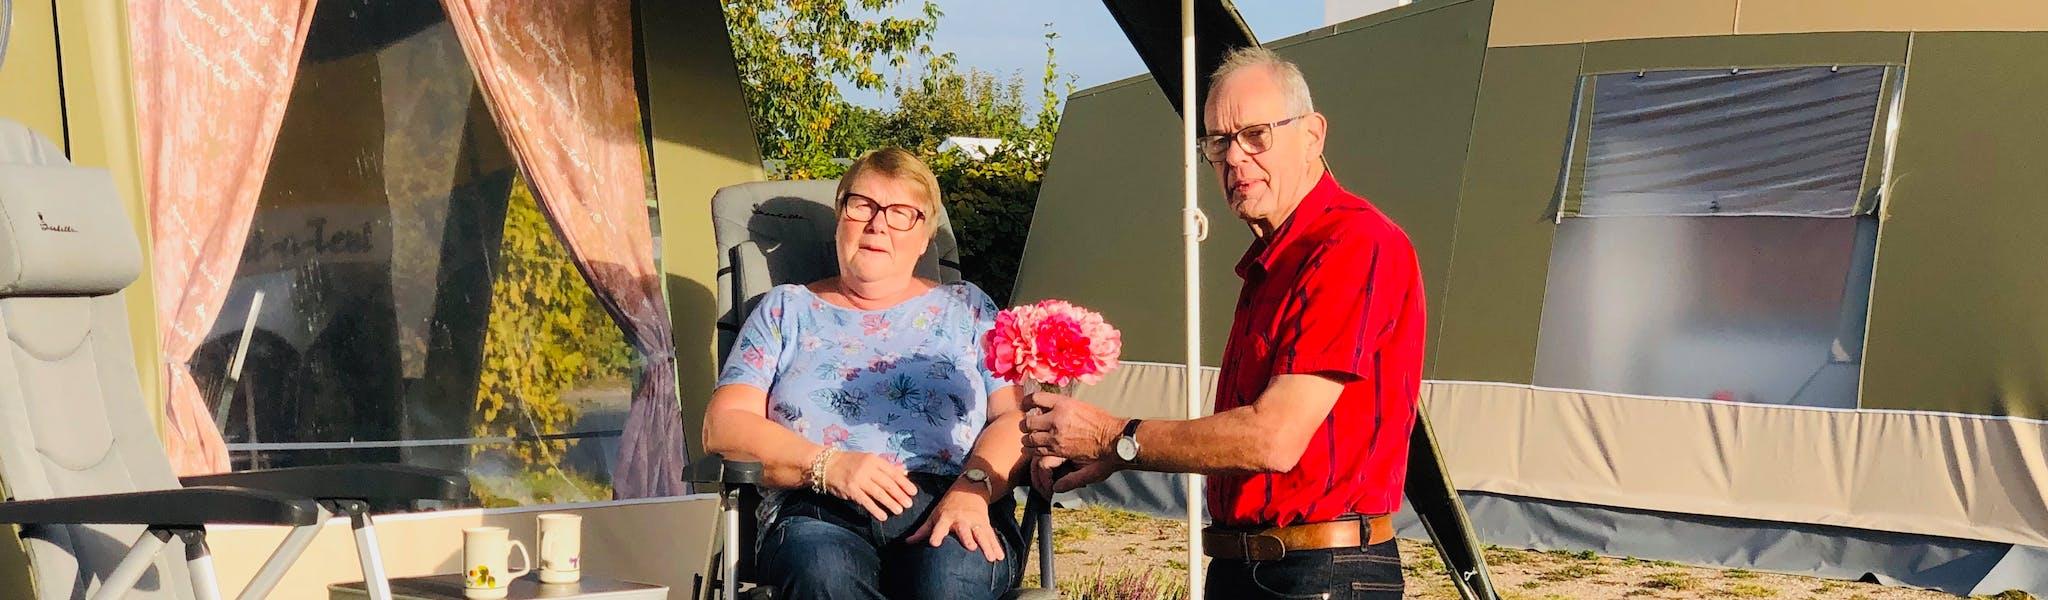 Henk & Sophie Versteegt camping Eschwege